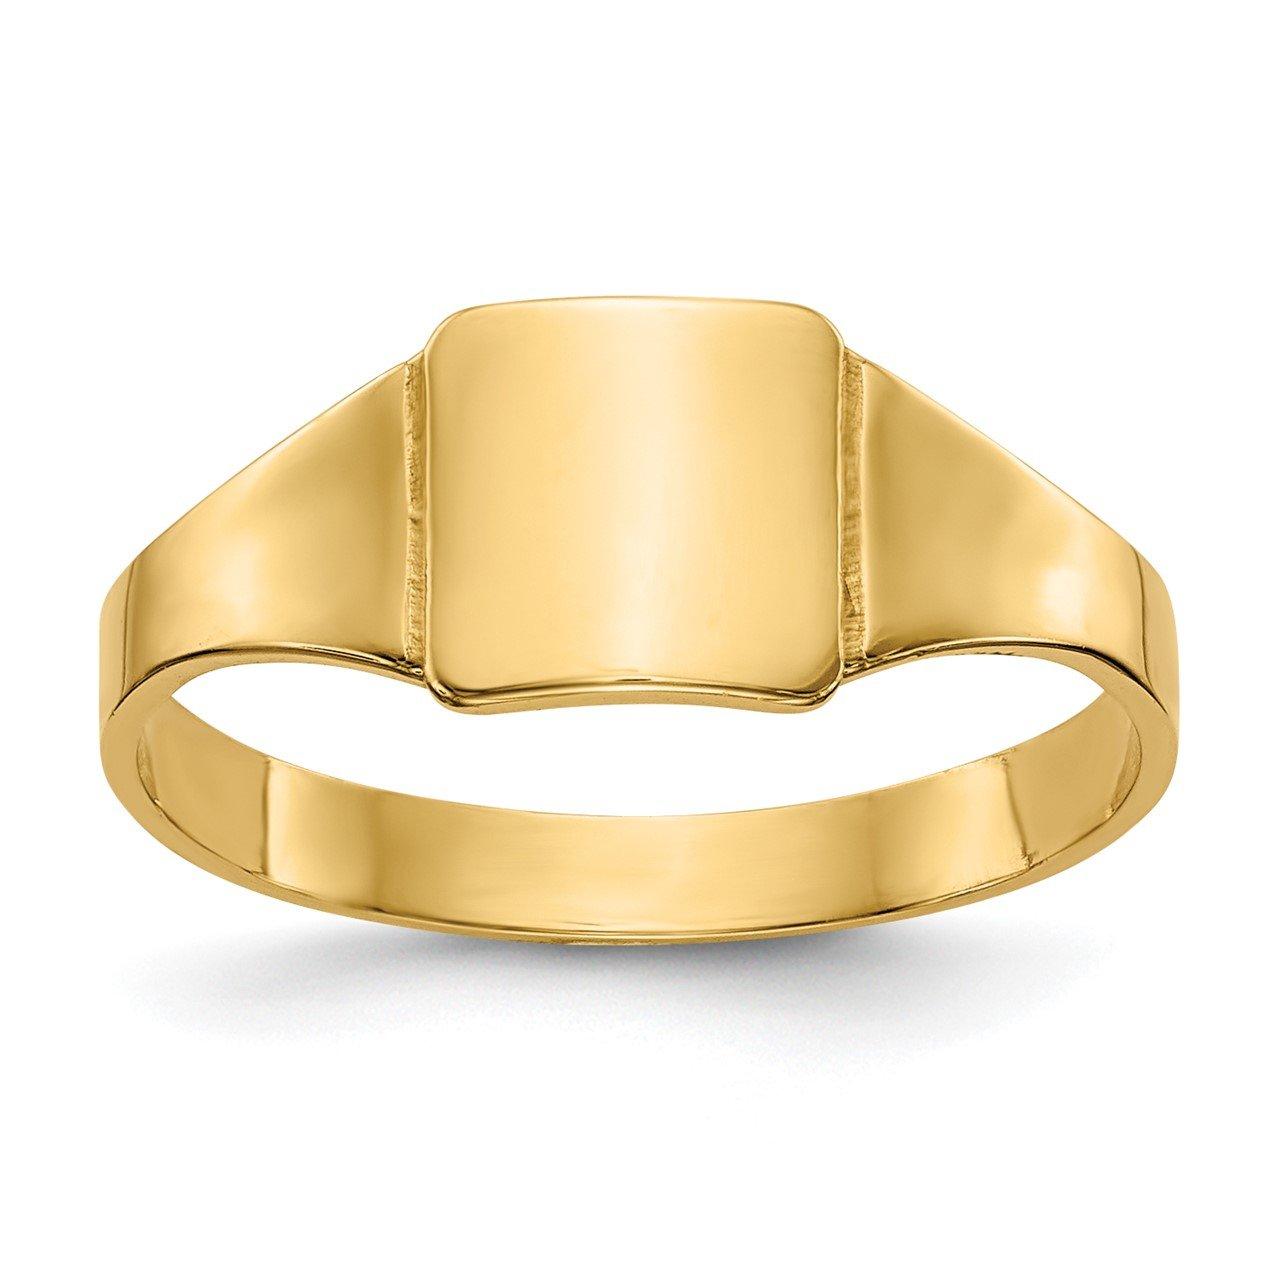 14k Polished Square Signet Baby Ring